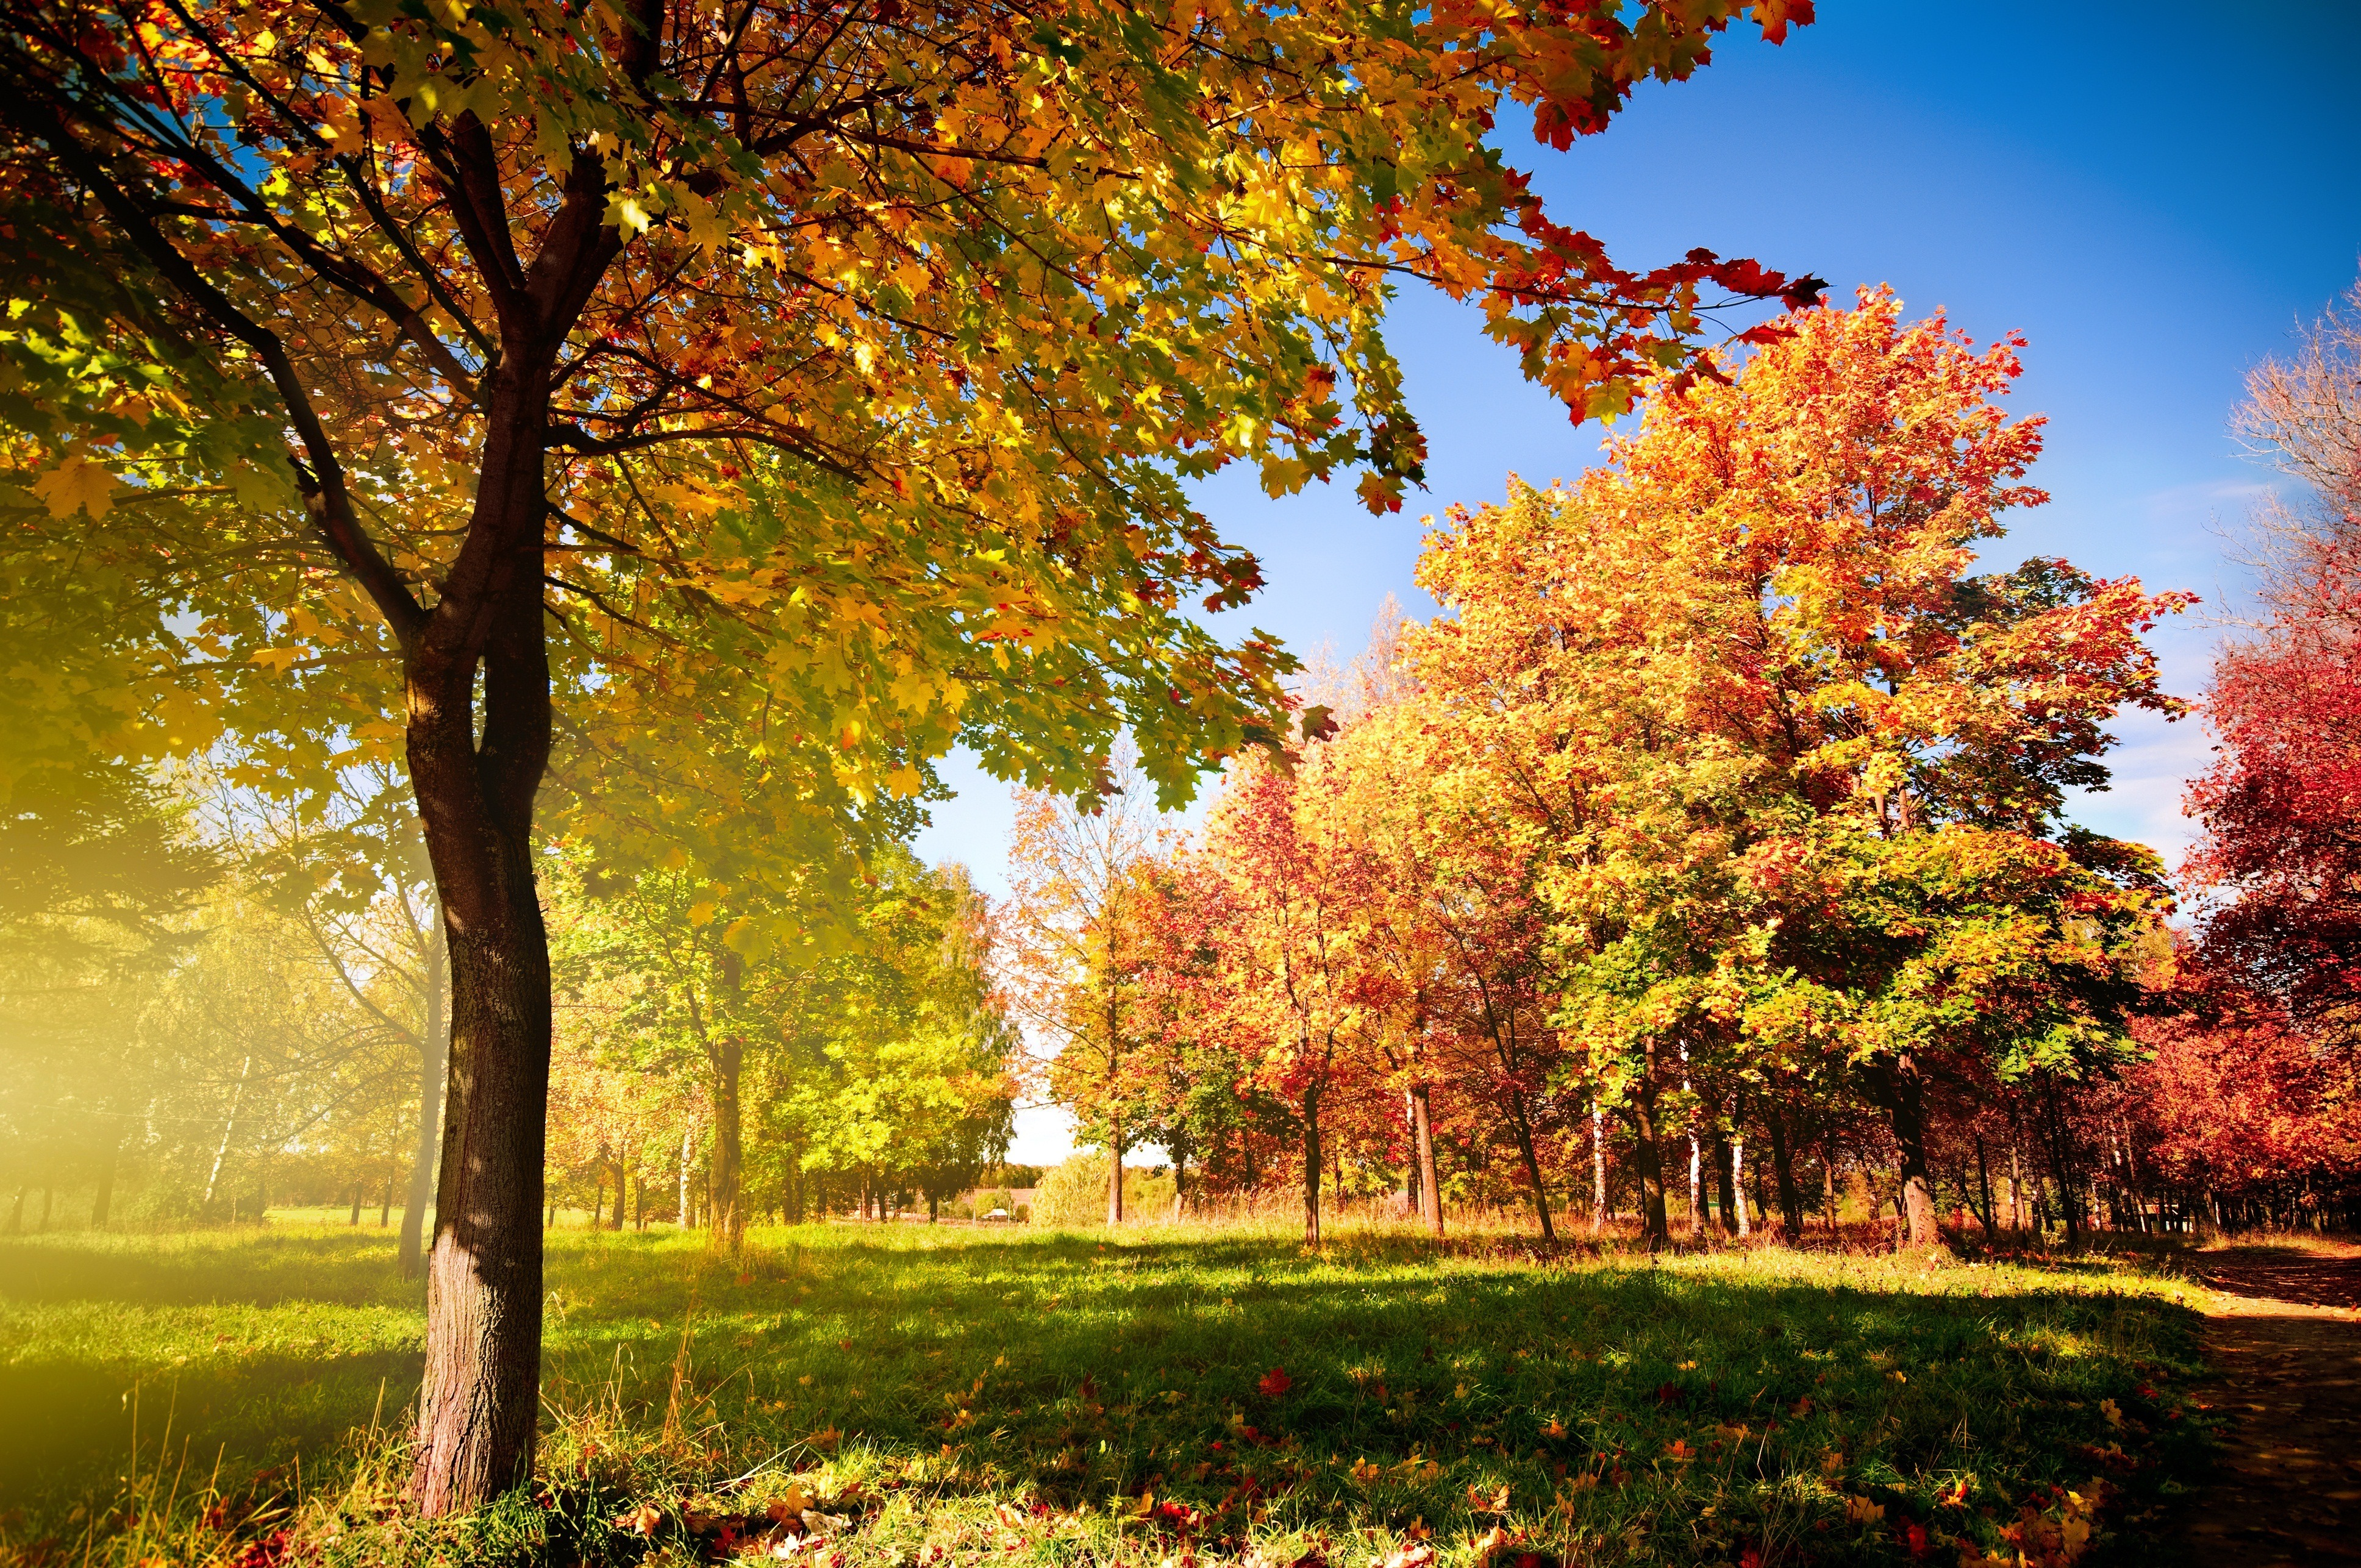 autumn trees osen derevya